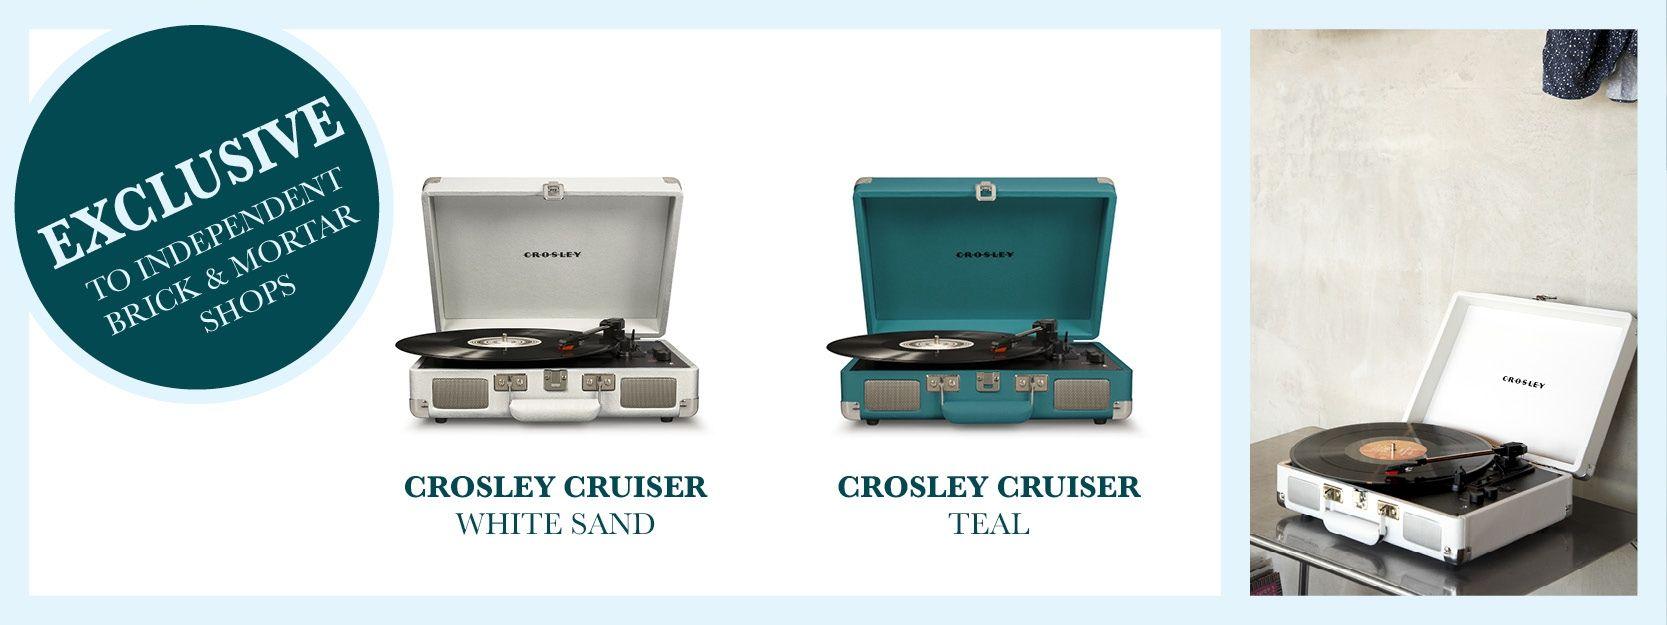 Crosley cruiser Teal & White Sand